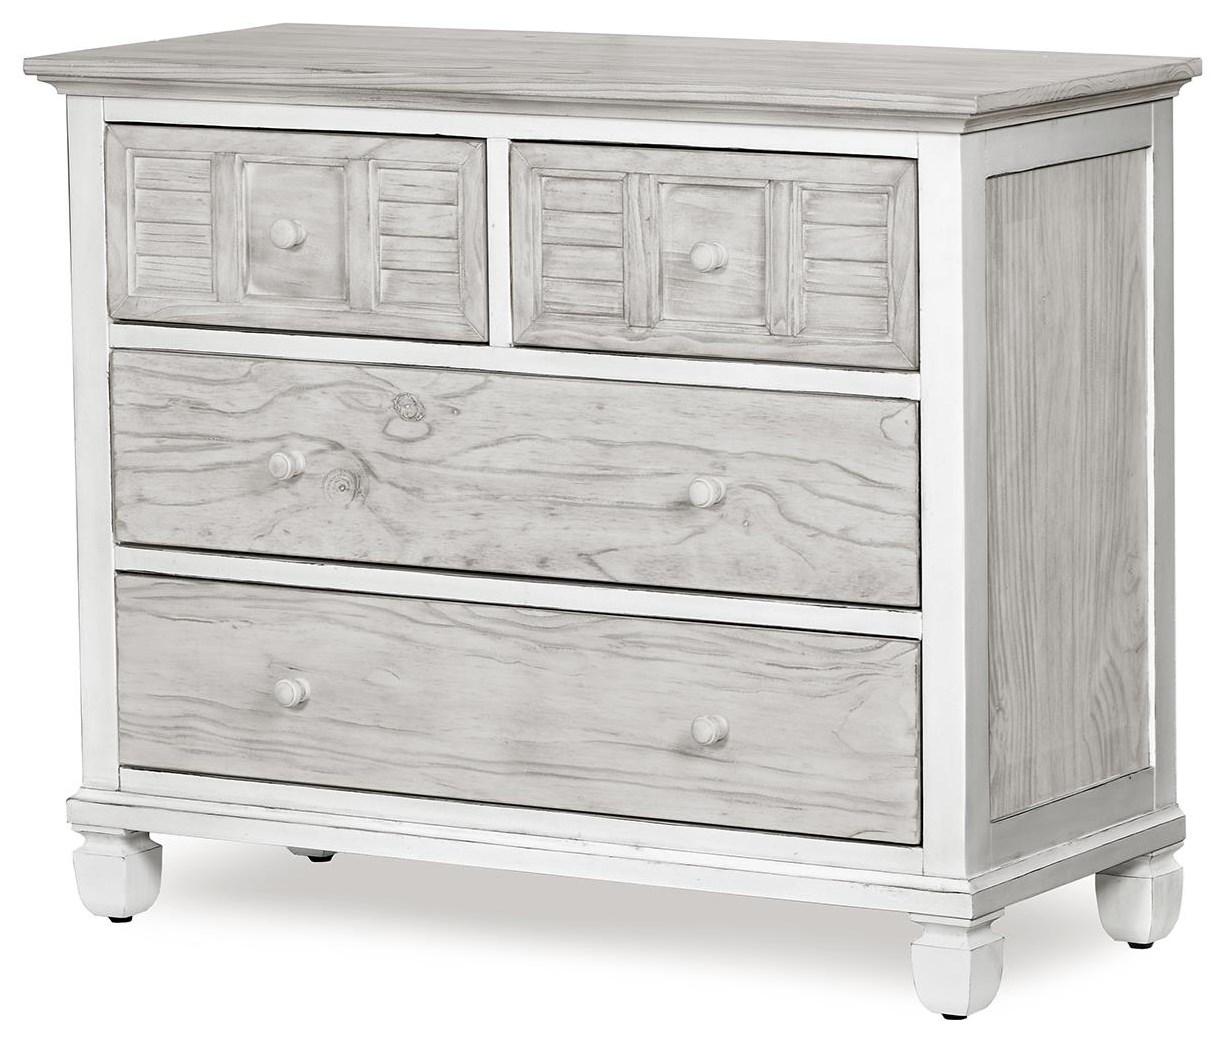 islamorada single dresser by Sea Winds Trading Company at Johnny Janosik